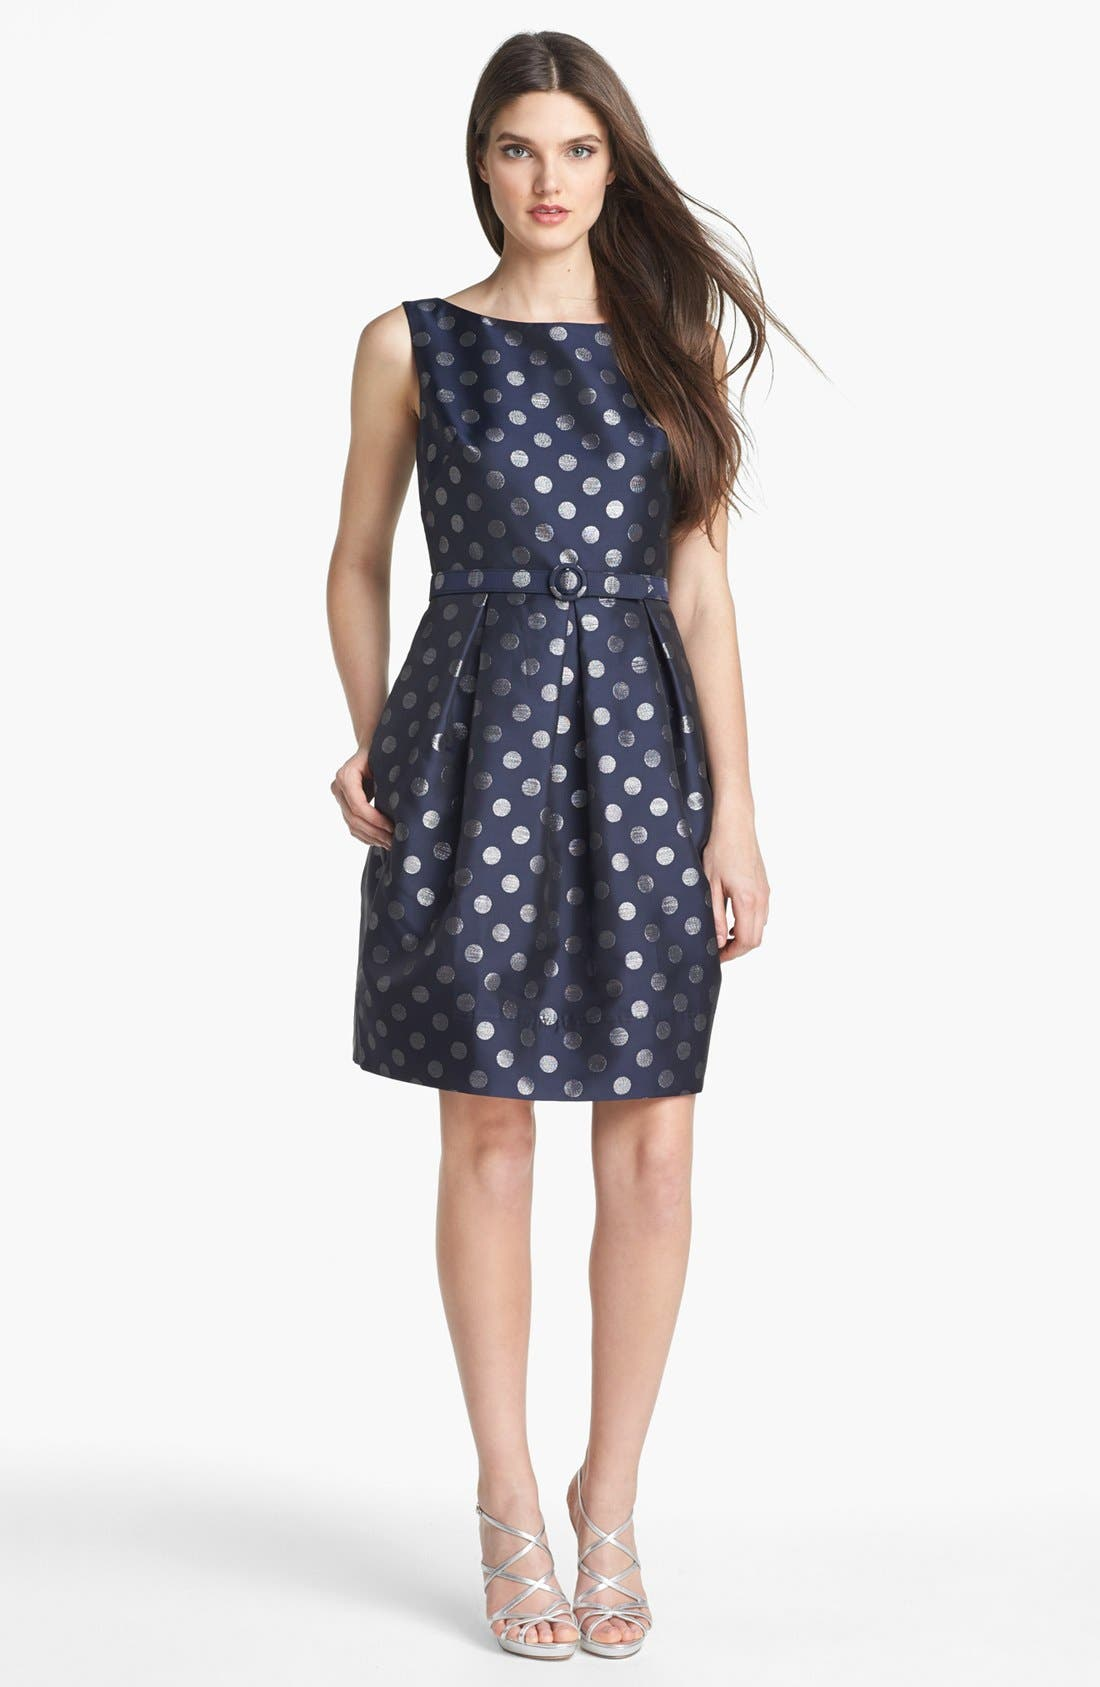 Main Image - Eliza J Metallic Polka Dot Fit & Flare Dress